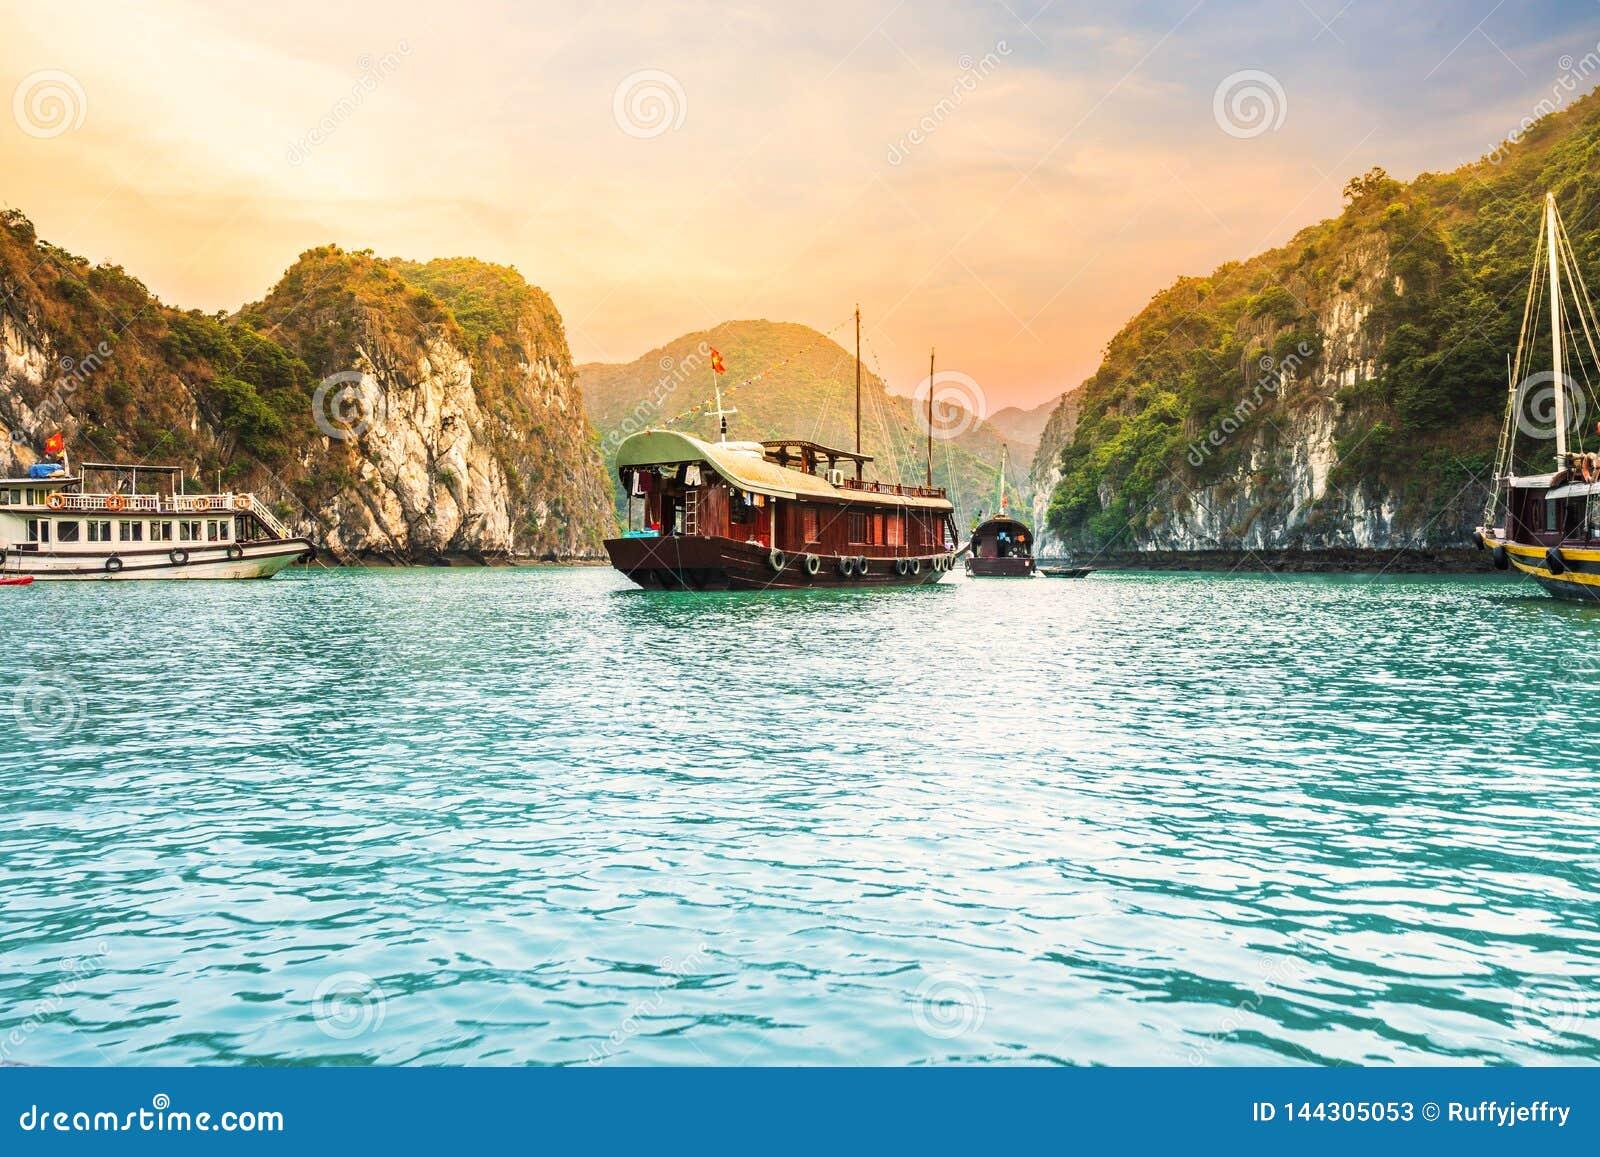 Beautiful sky and Cruise ship on Halong Bay, Vietnam